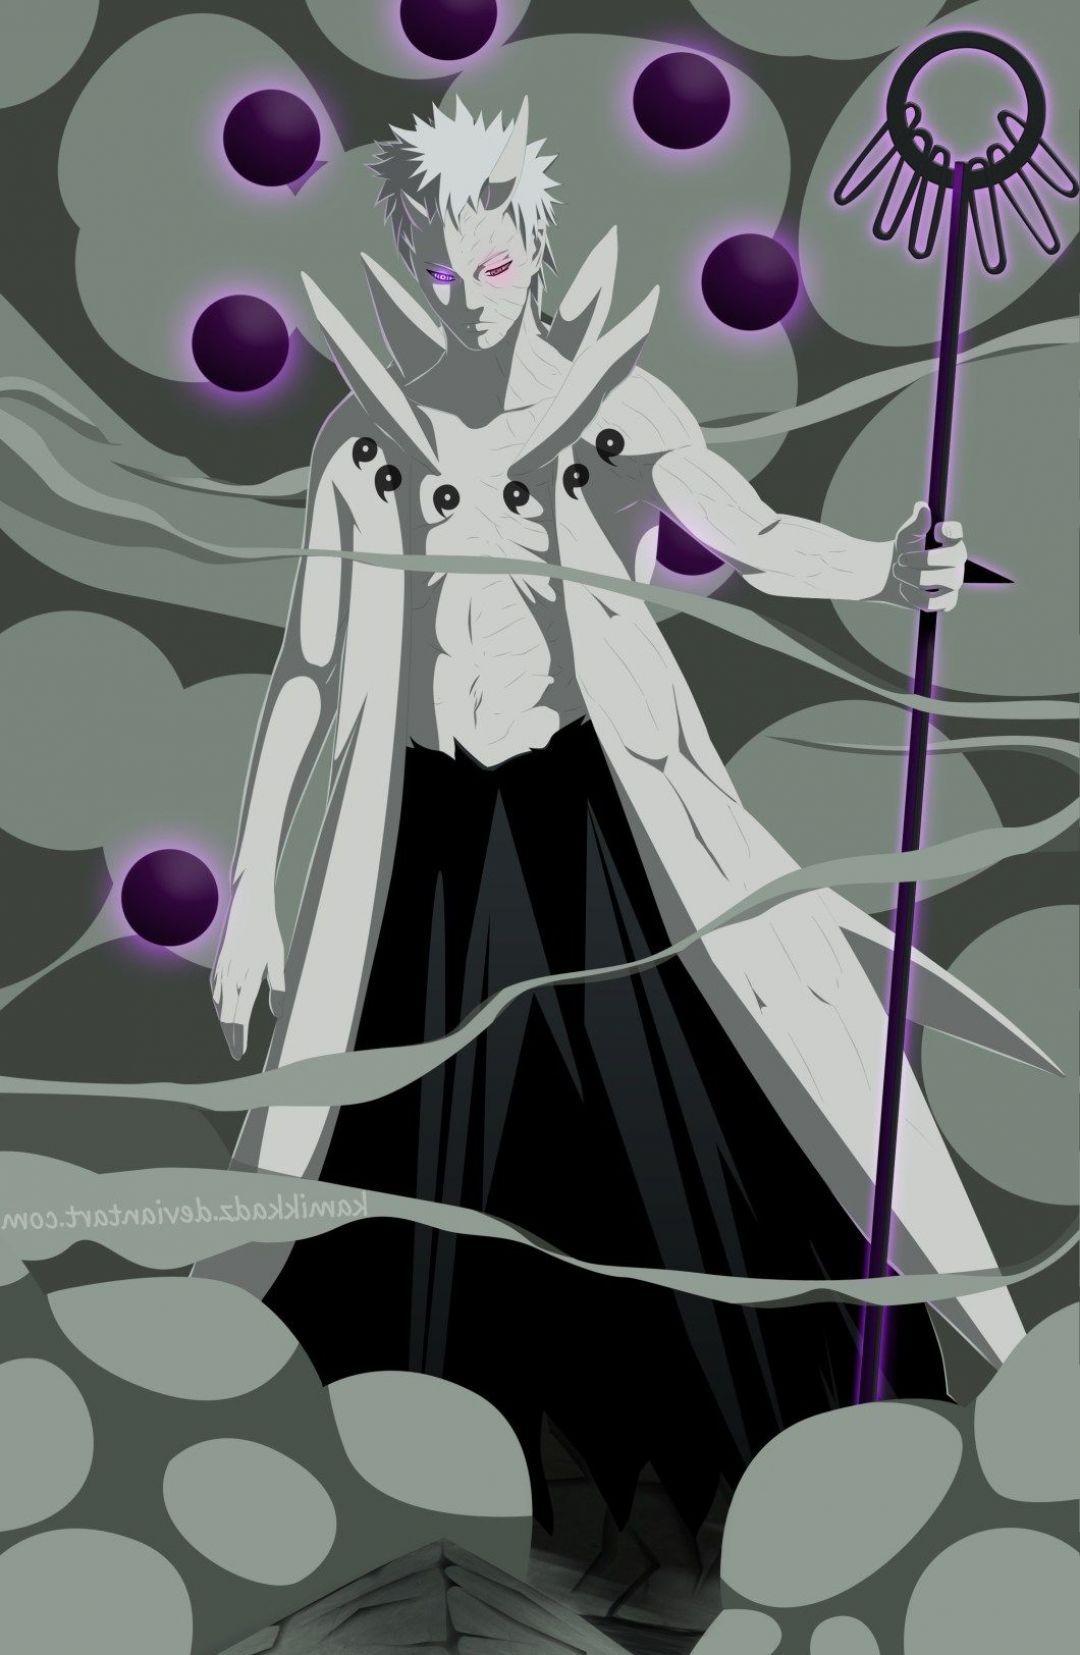 Aesthetic 1080p Naruto Wallpaper Iphone Hd